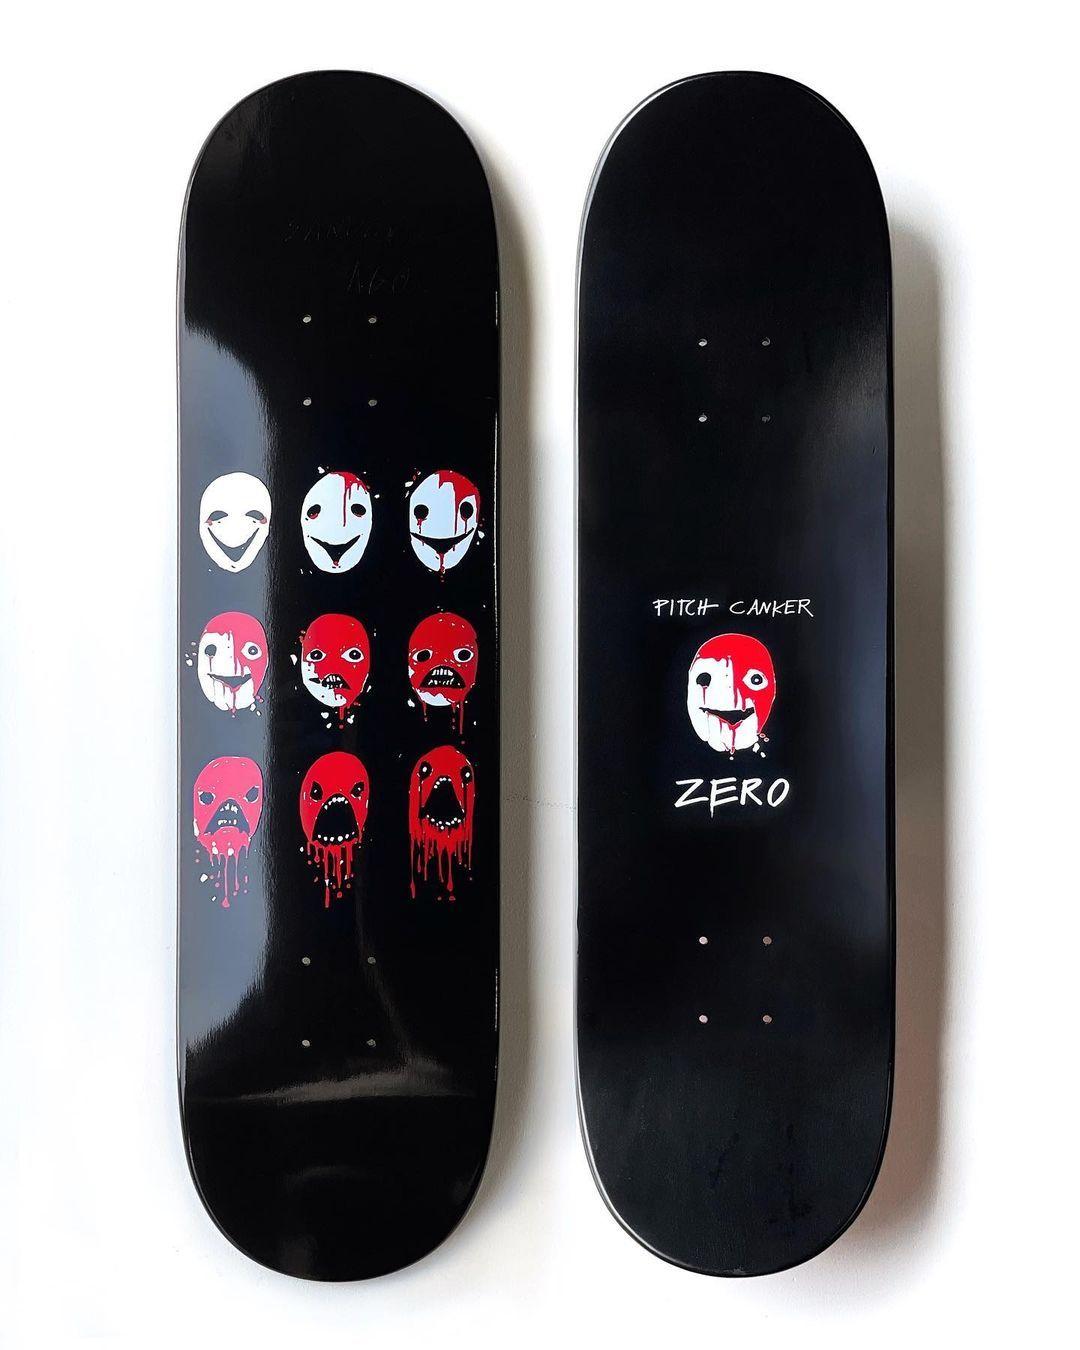 Pitch Canker X Zero Skateboards 10